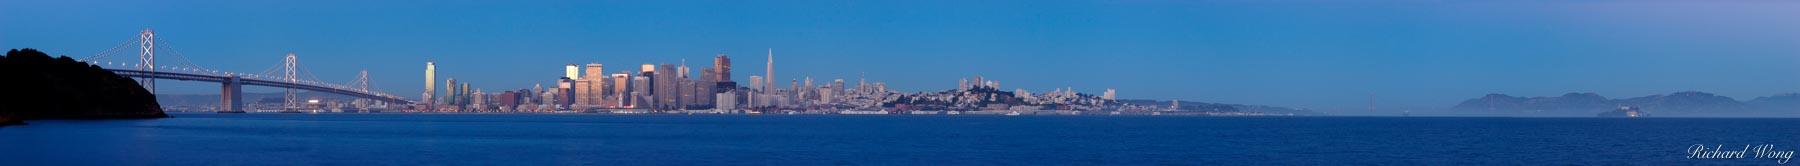 Panoramic of San Francisco, California